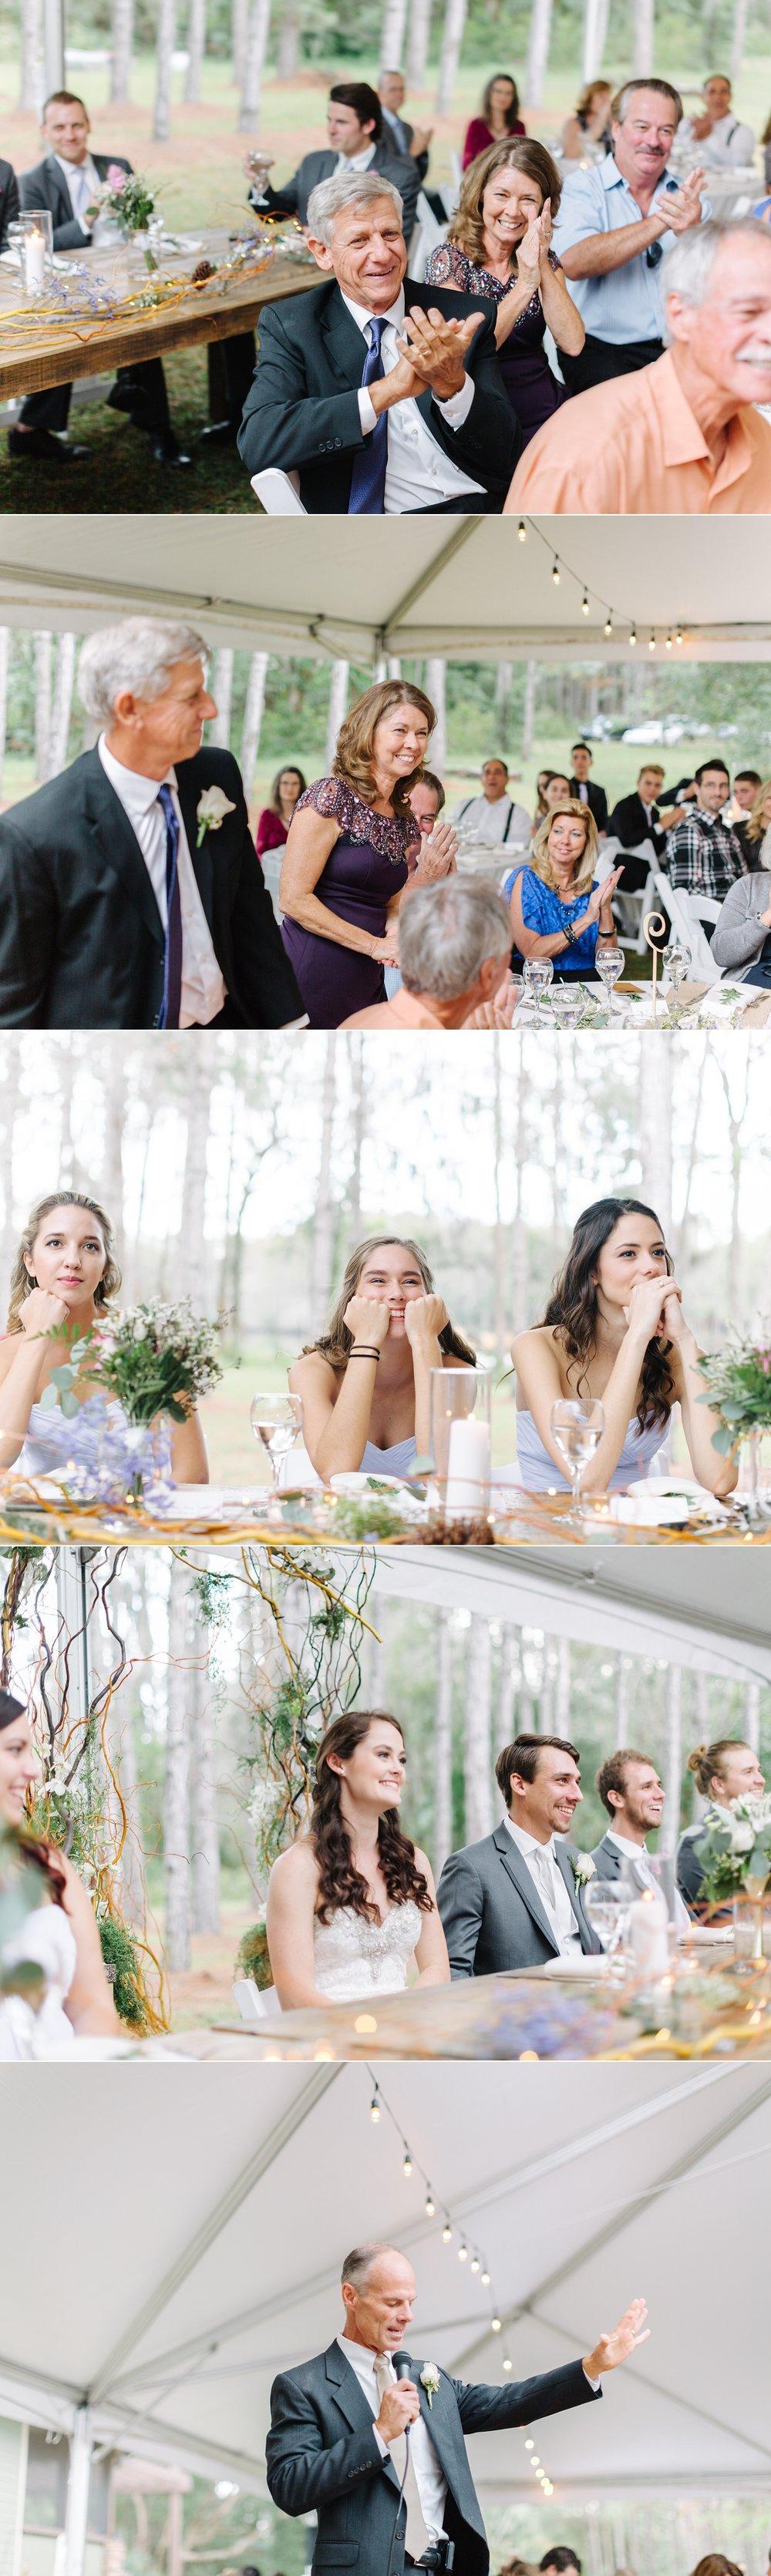 wa wedding blog-64.jpg